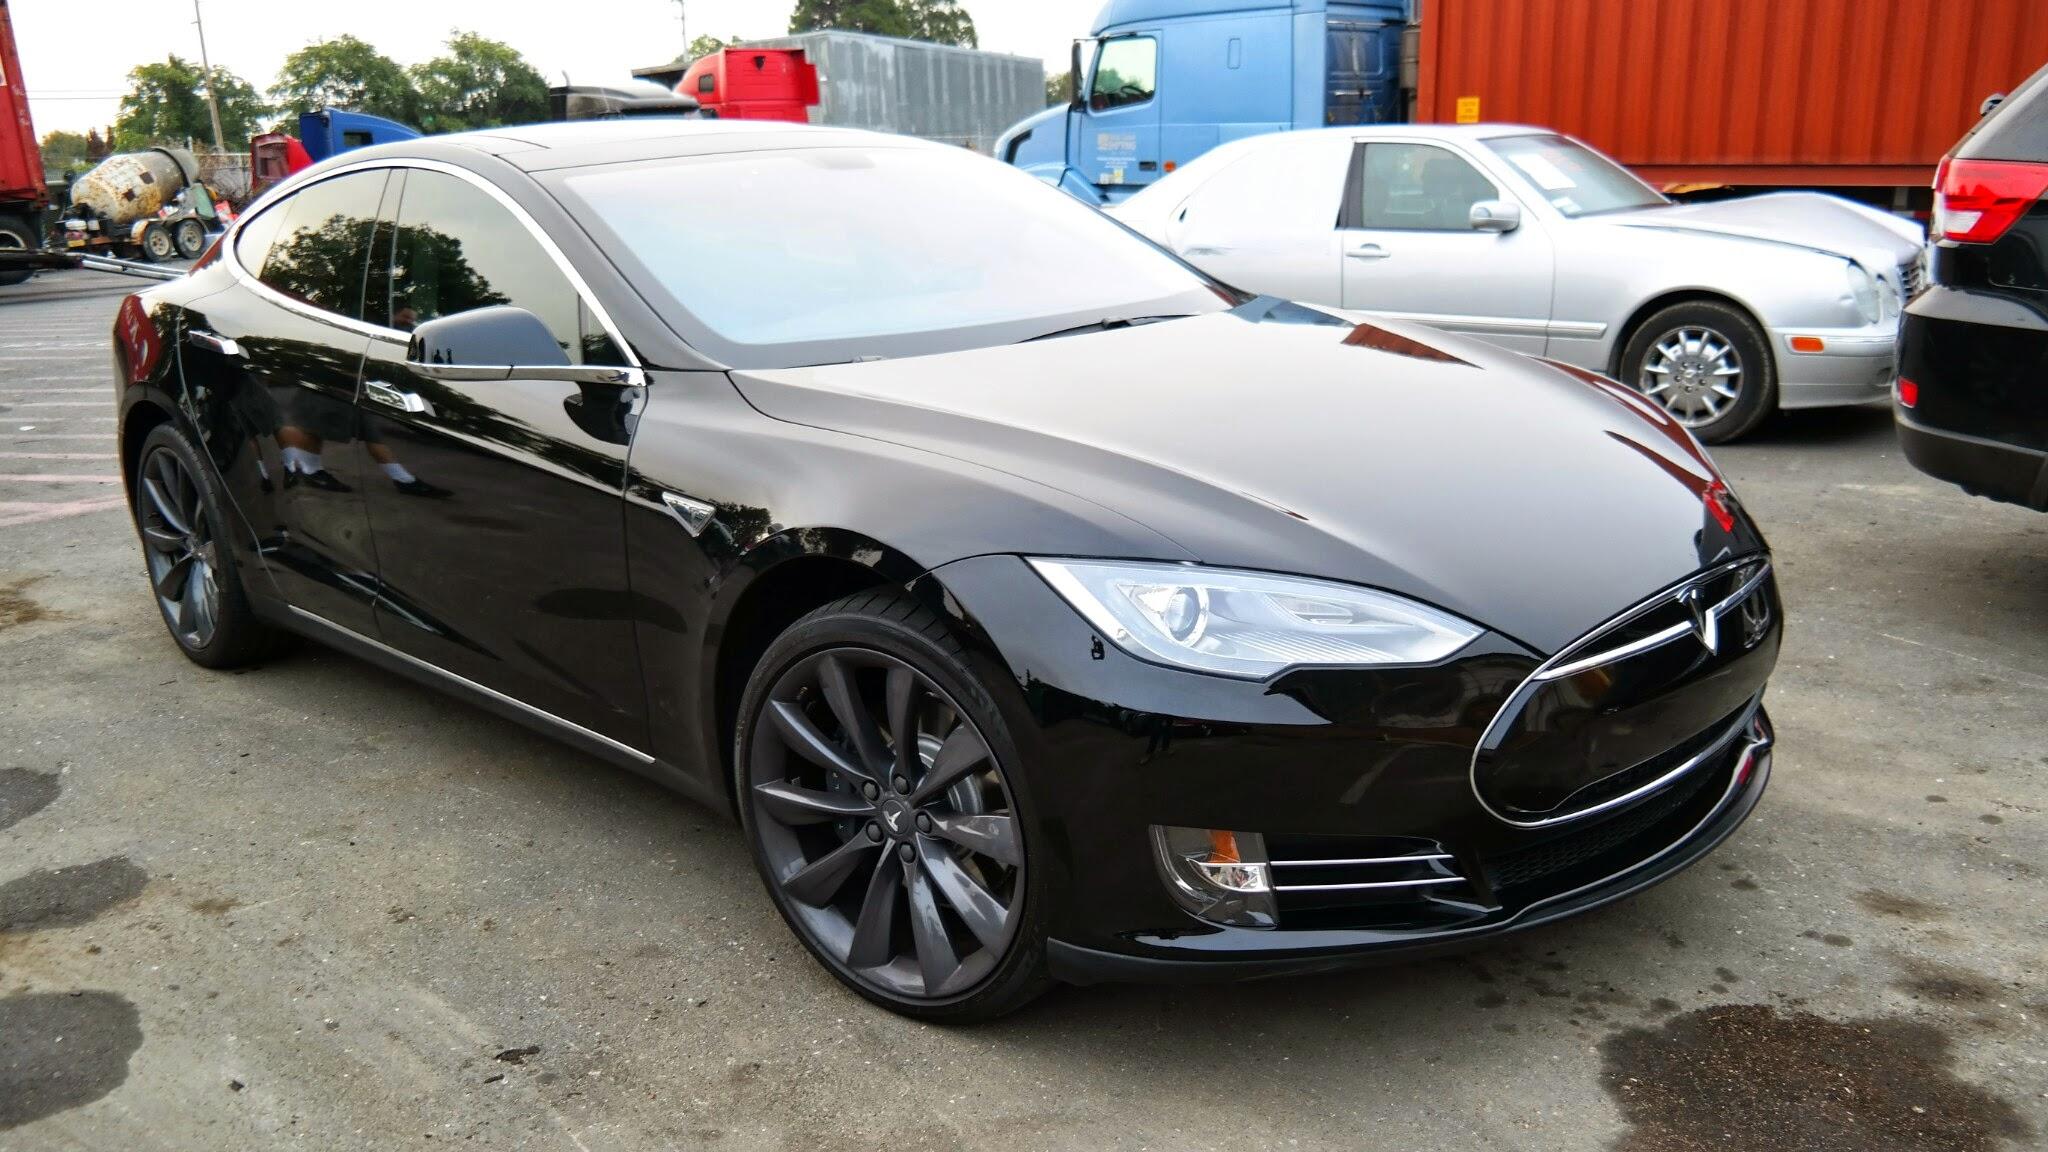 Ukraine abolishes the import duty on electric cars